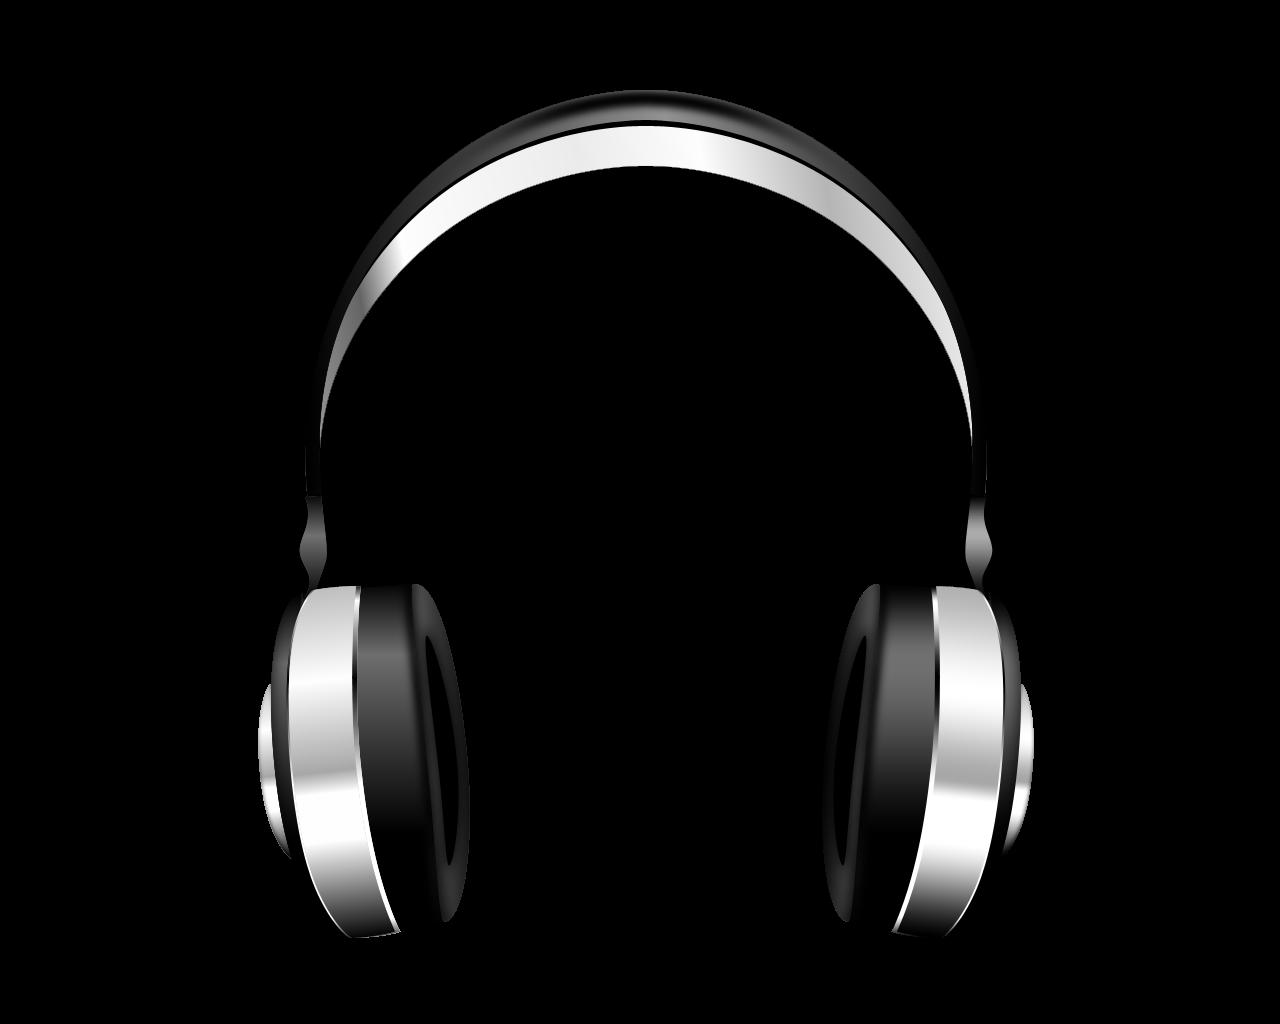 psd-headphones.png